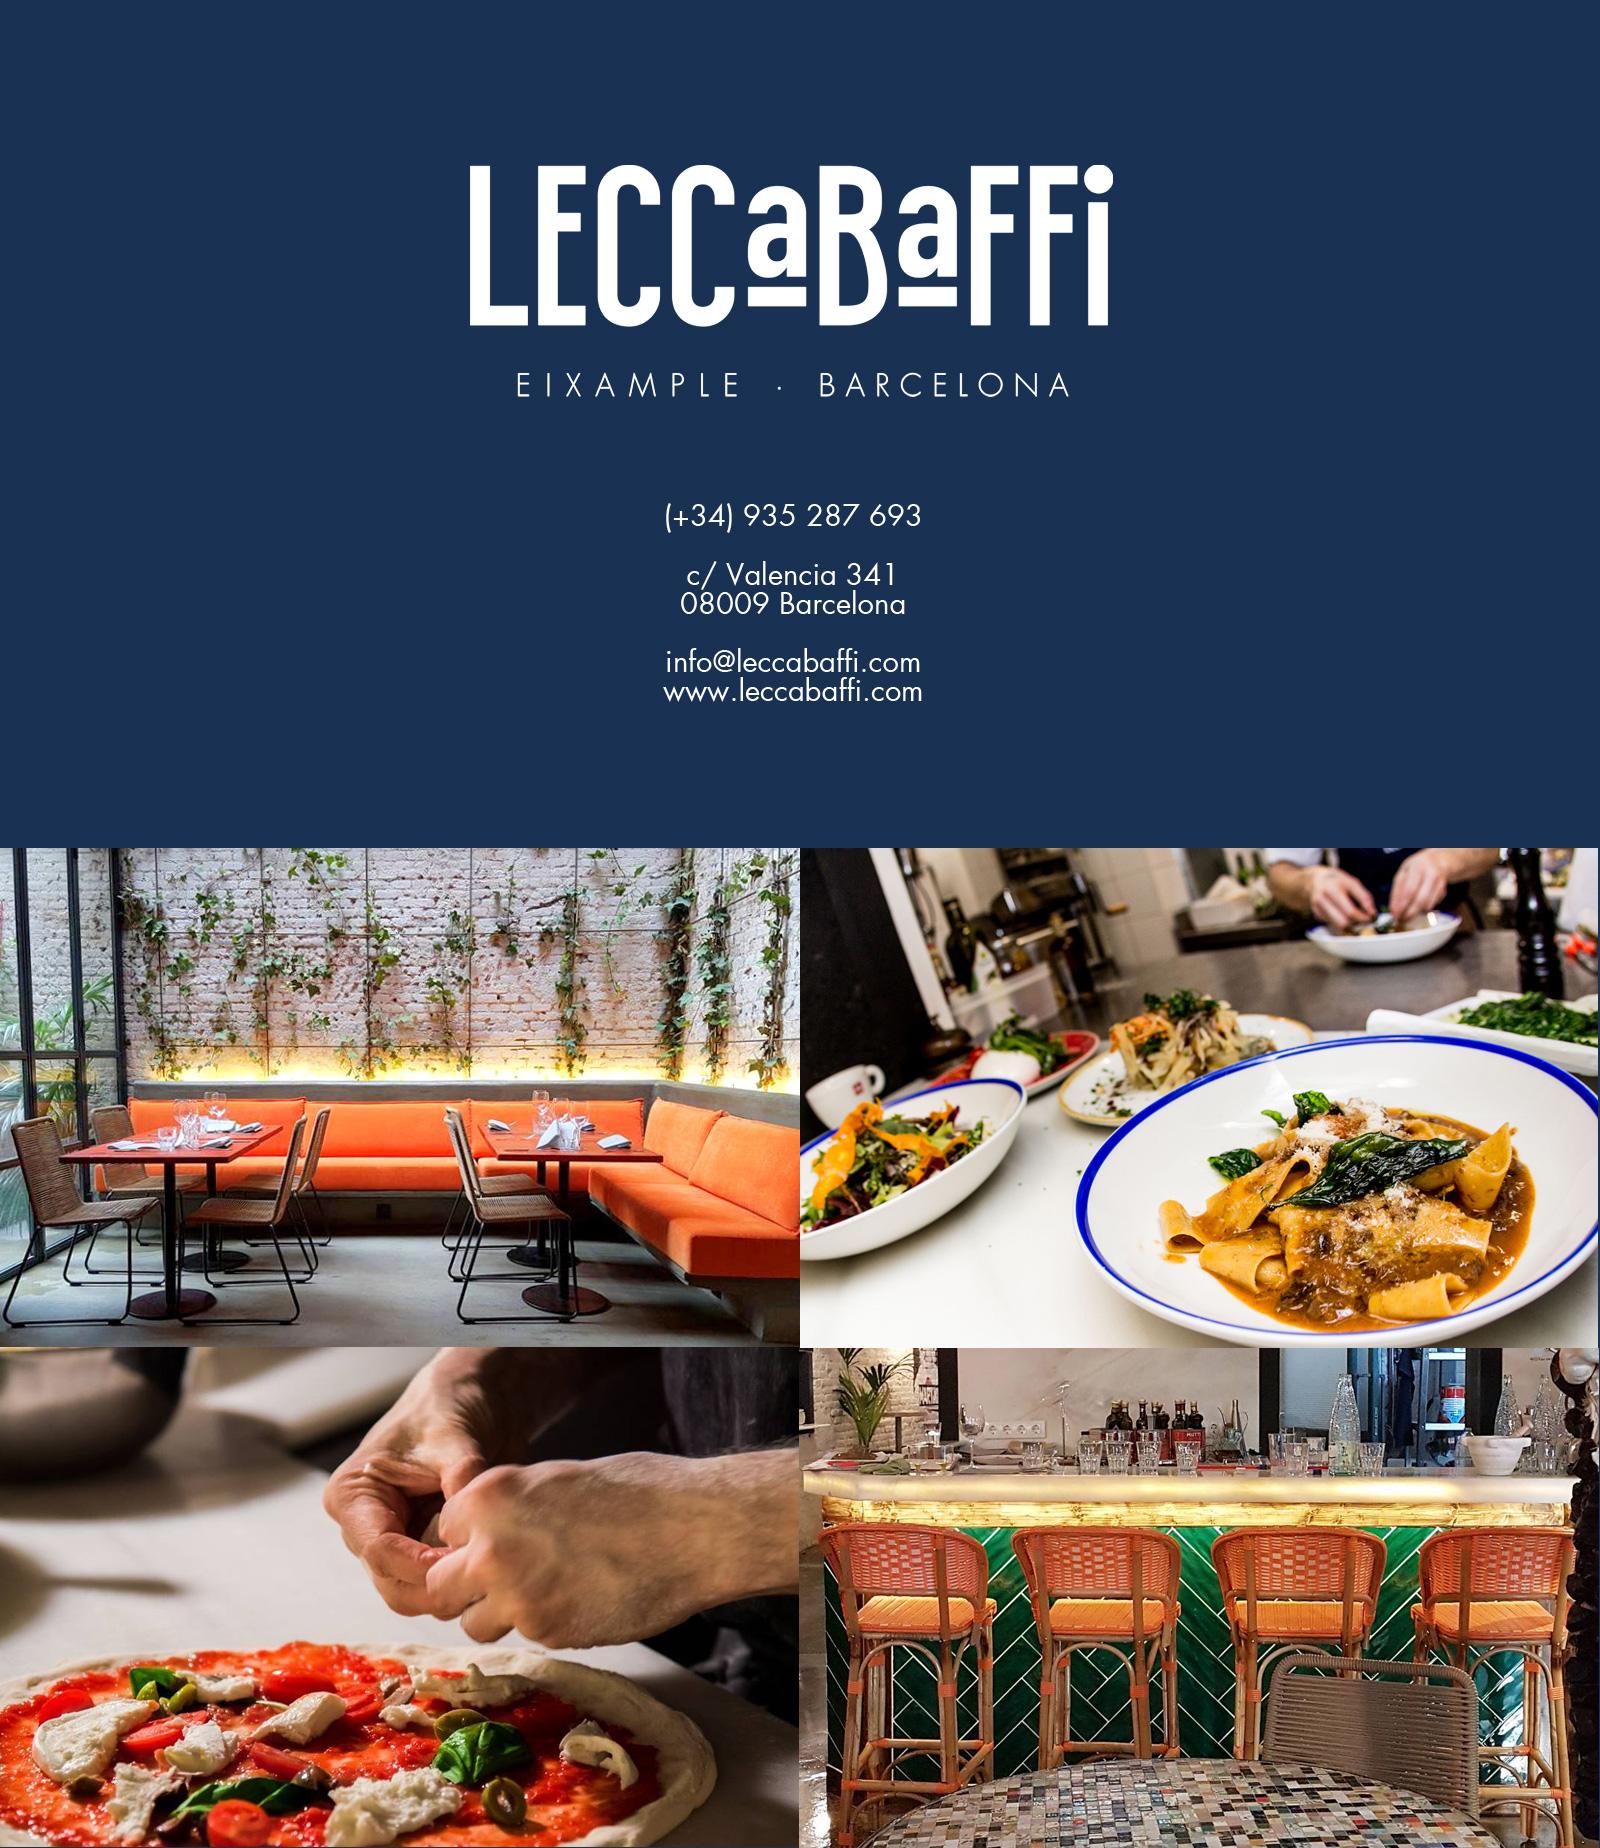 LeccaBaffi